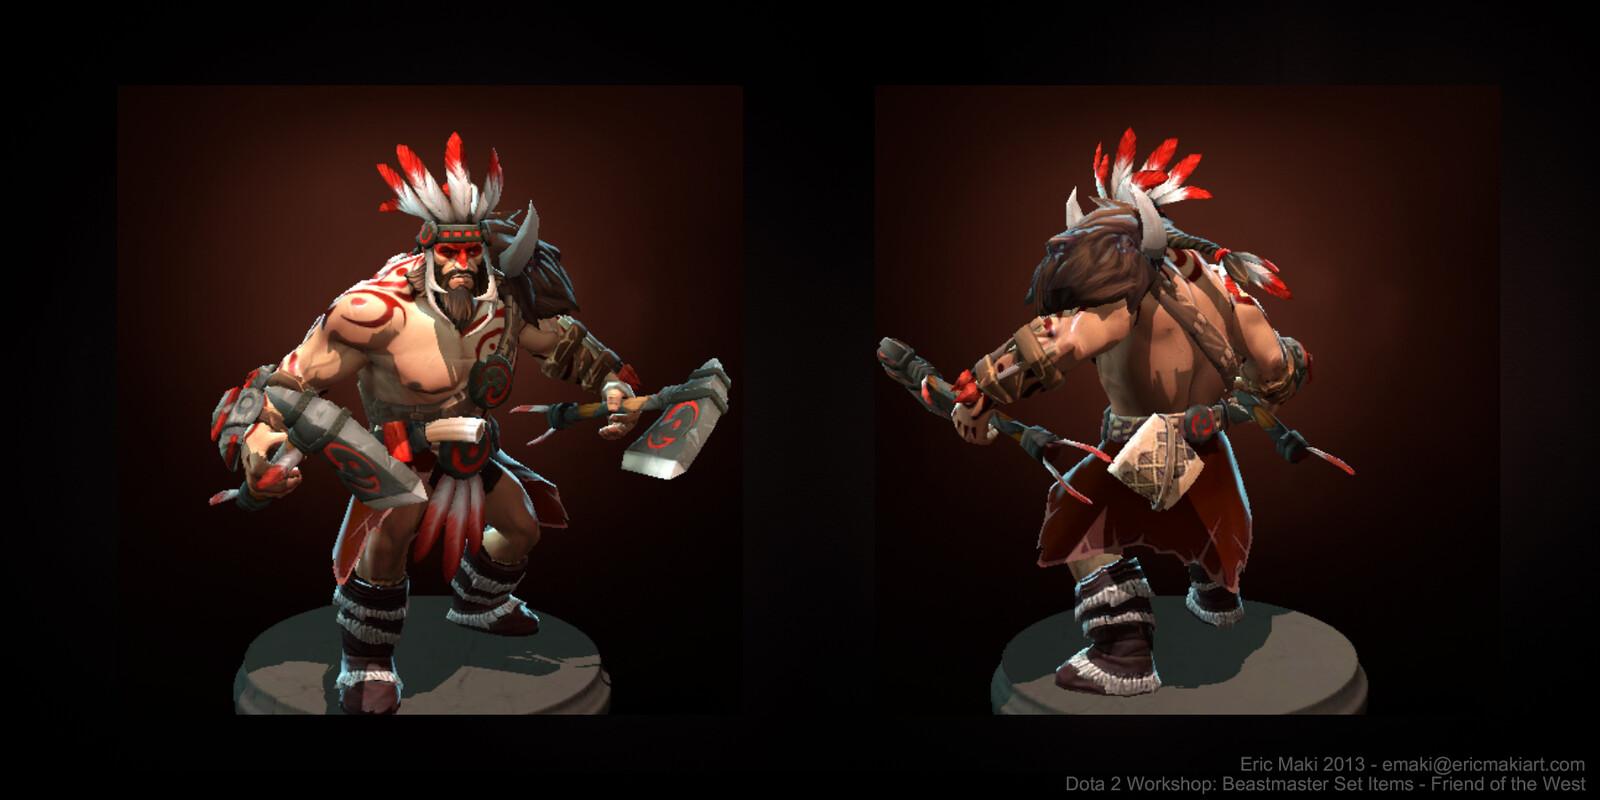 Beastmaster Set: In-game